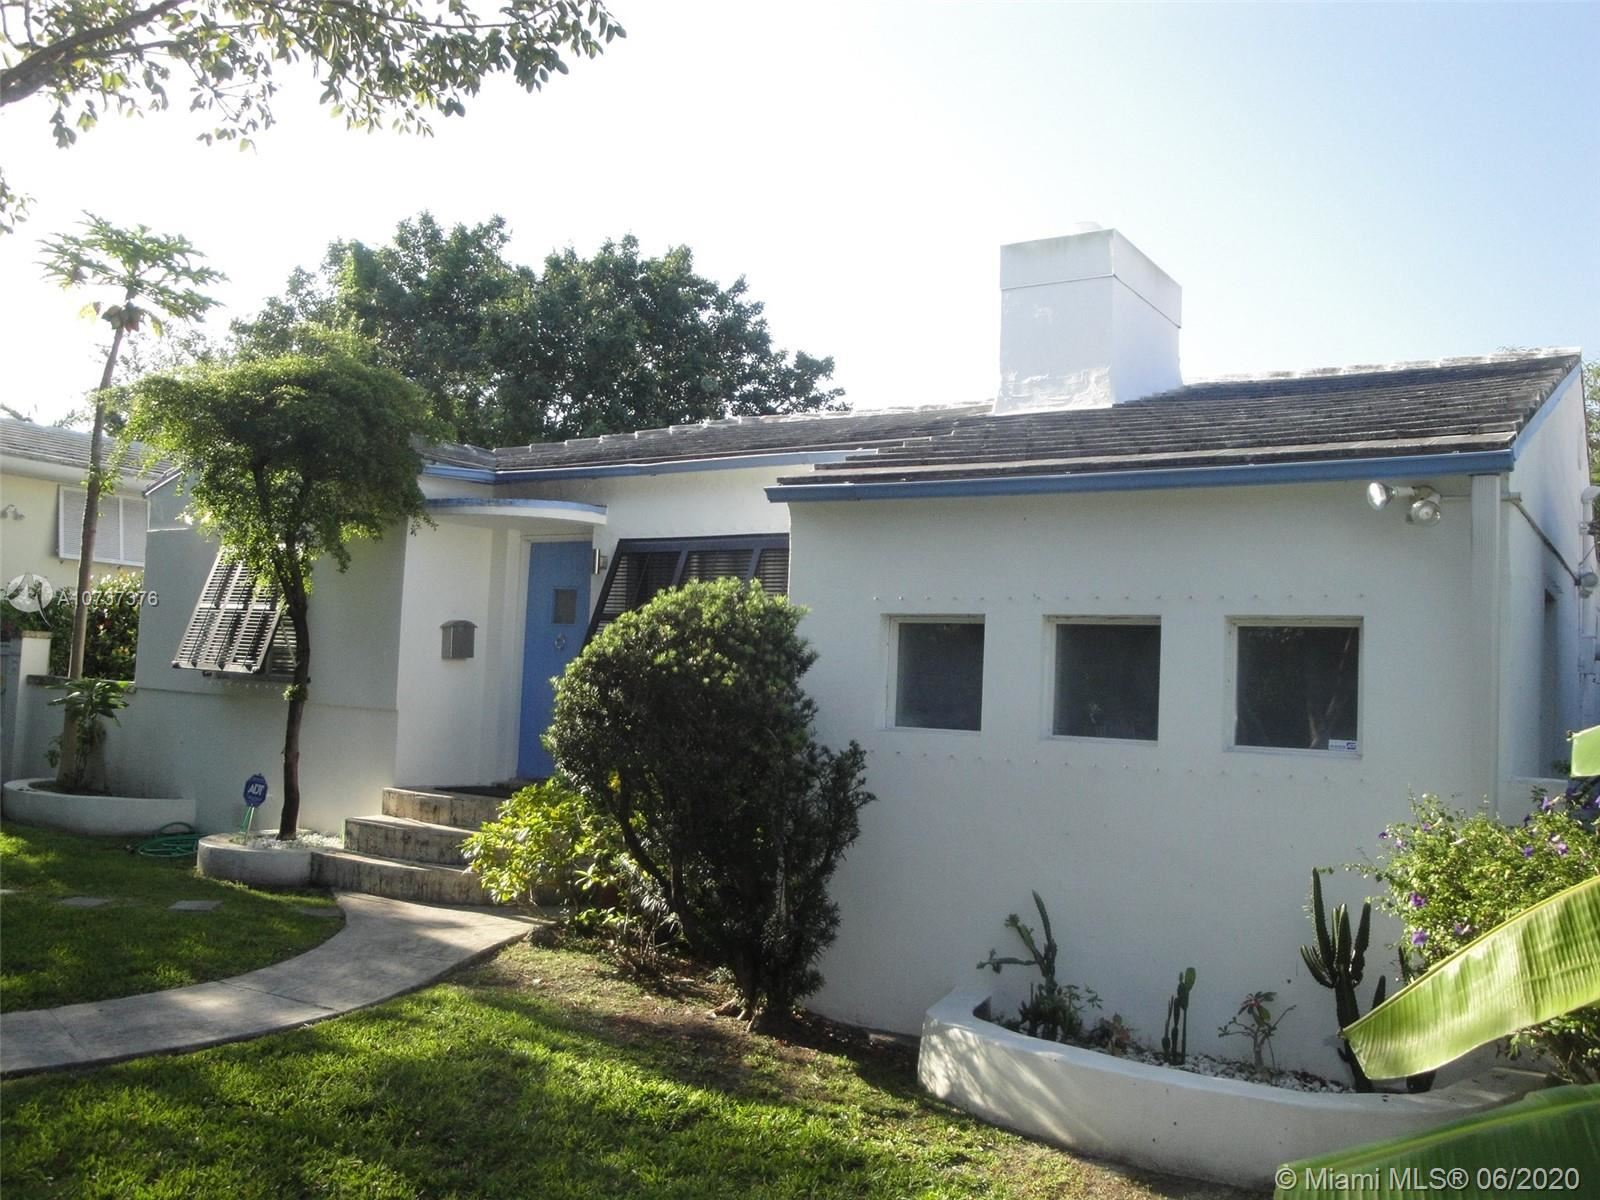 Photo 1 of Listing MLS a10737376 in 200 NE 85th St El Portal FL 33138